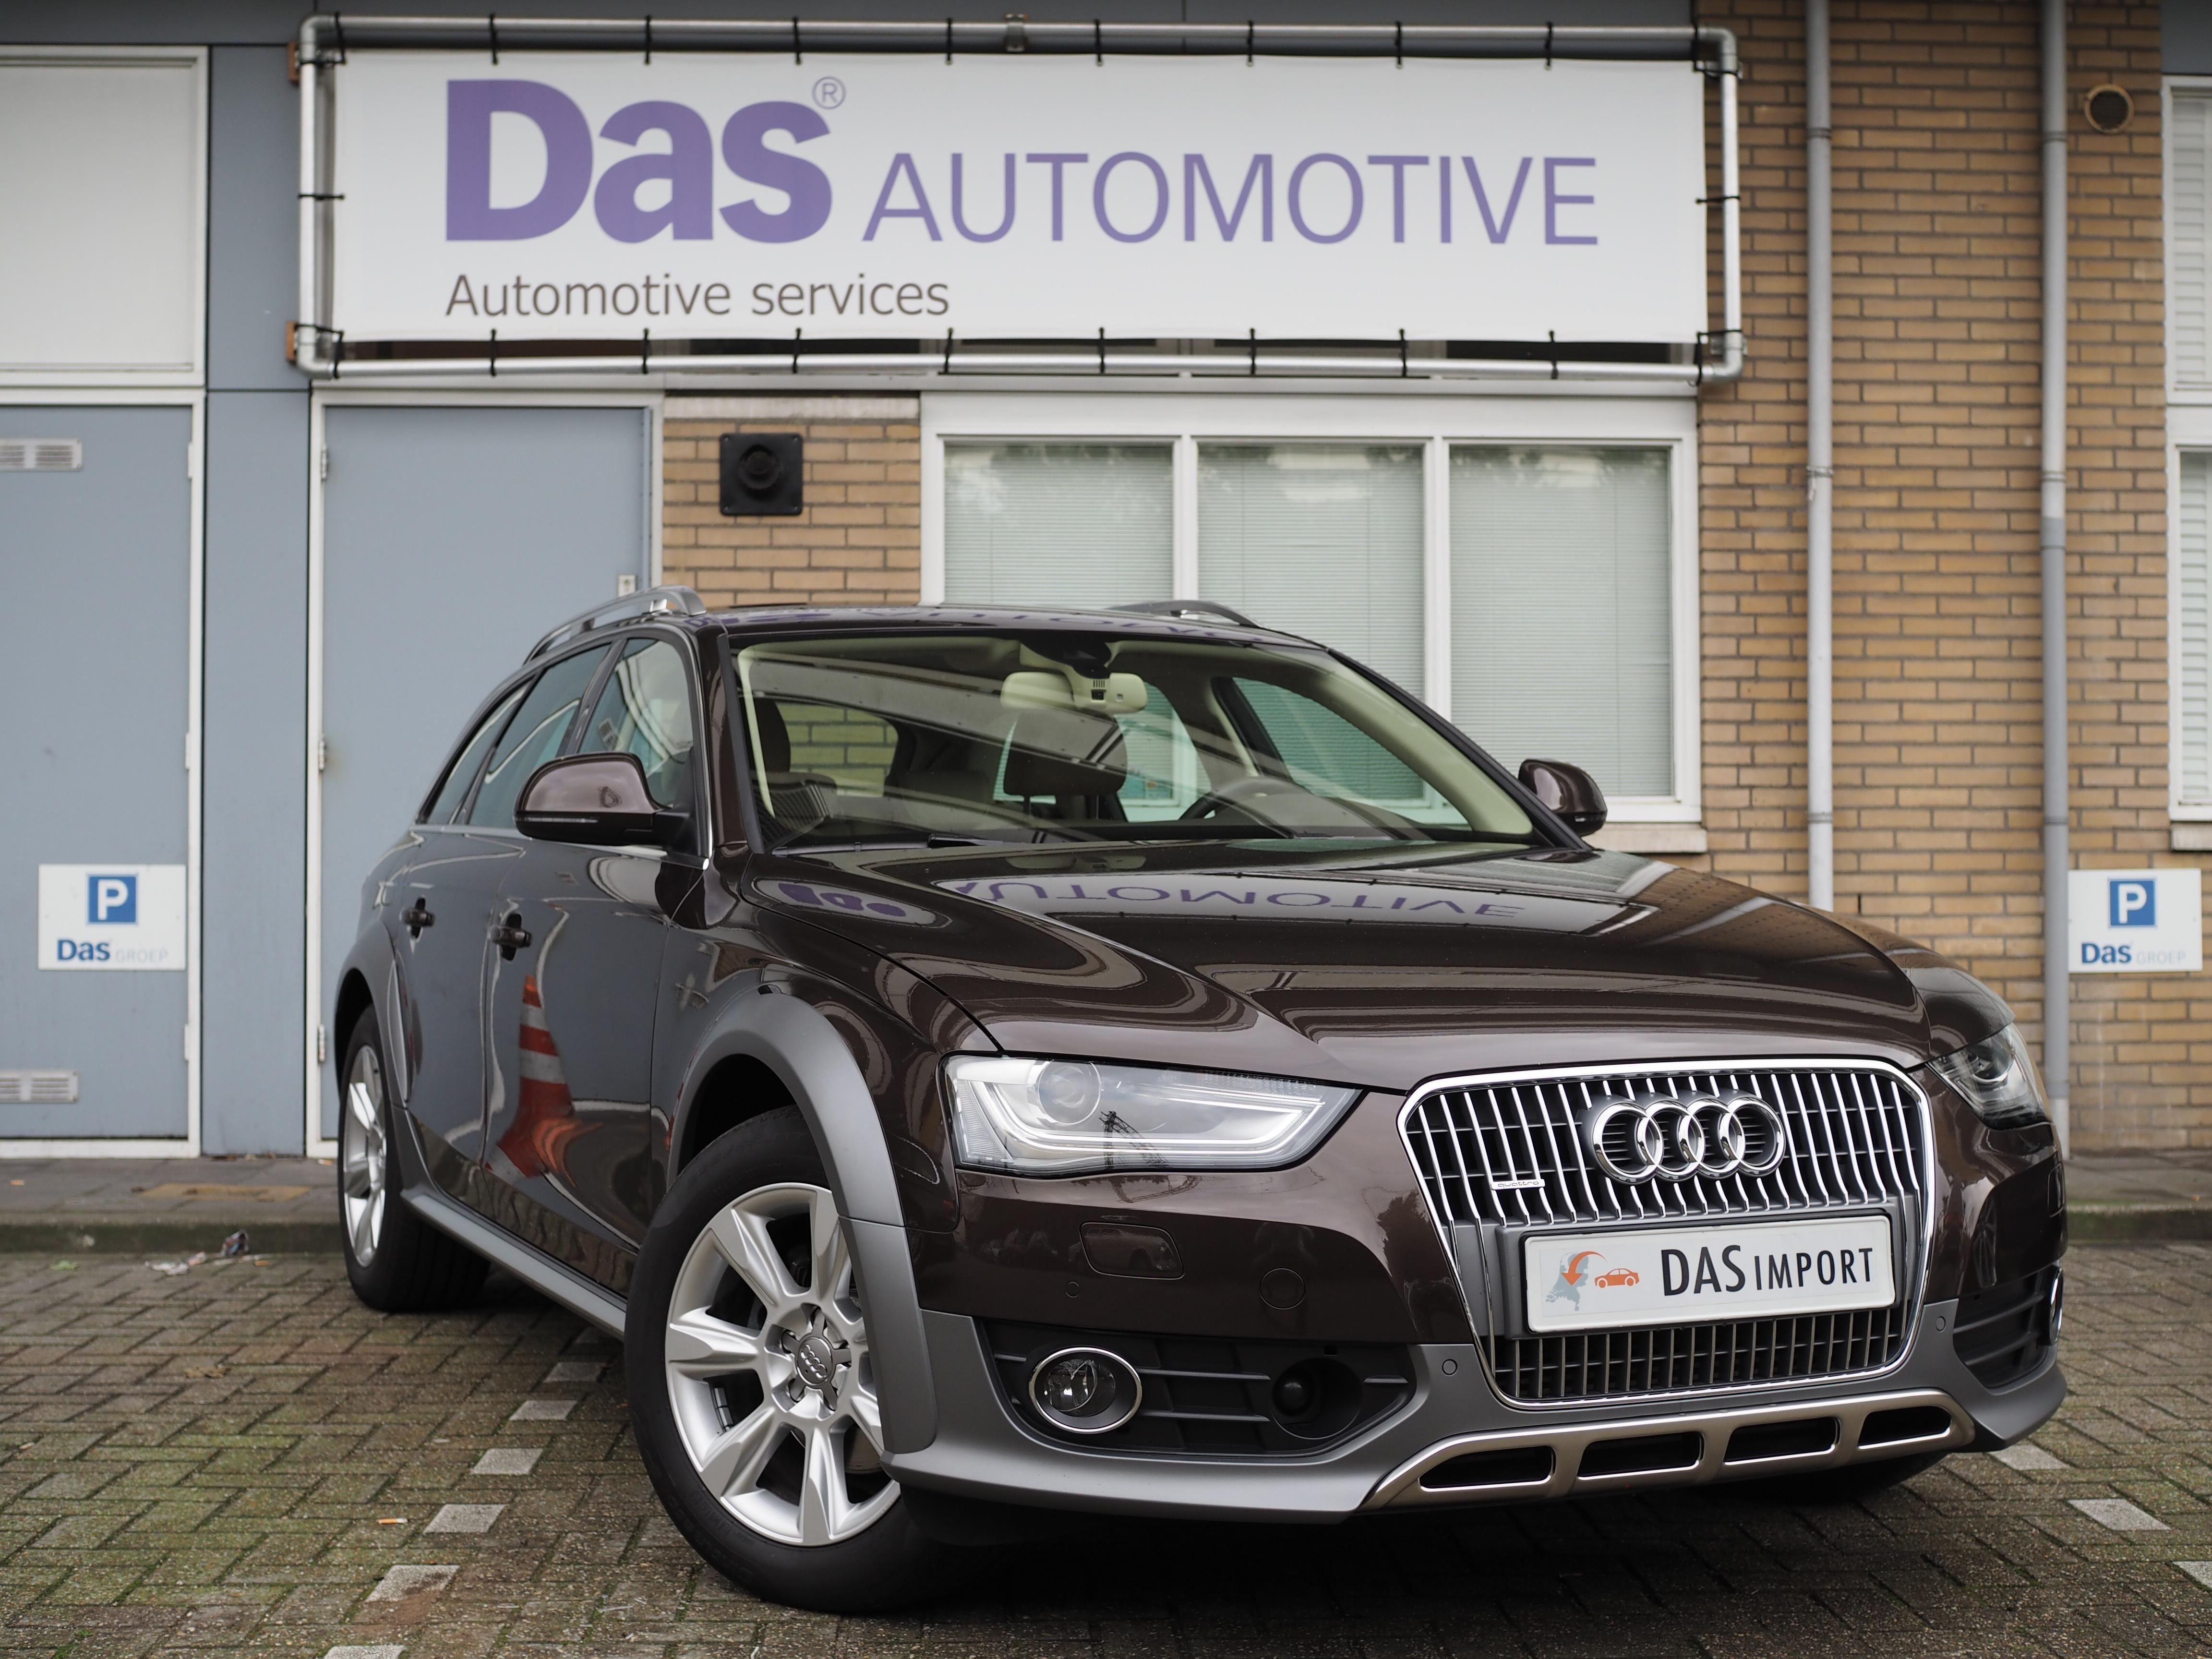 Importauto: Audi A4 Allroad Diesel 2.0 TDI 140kW quattro S tronic 1/2015